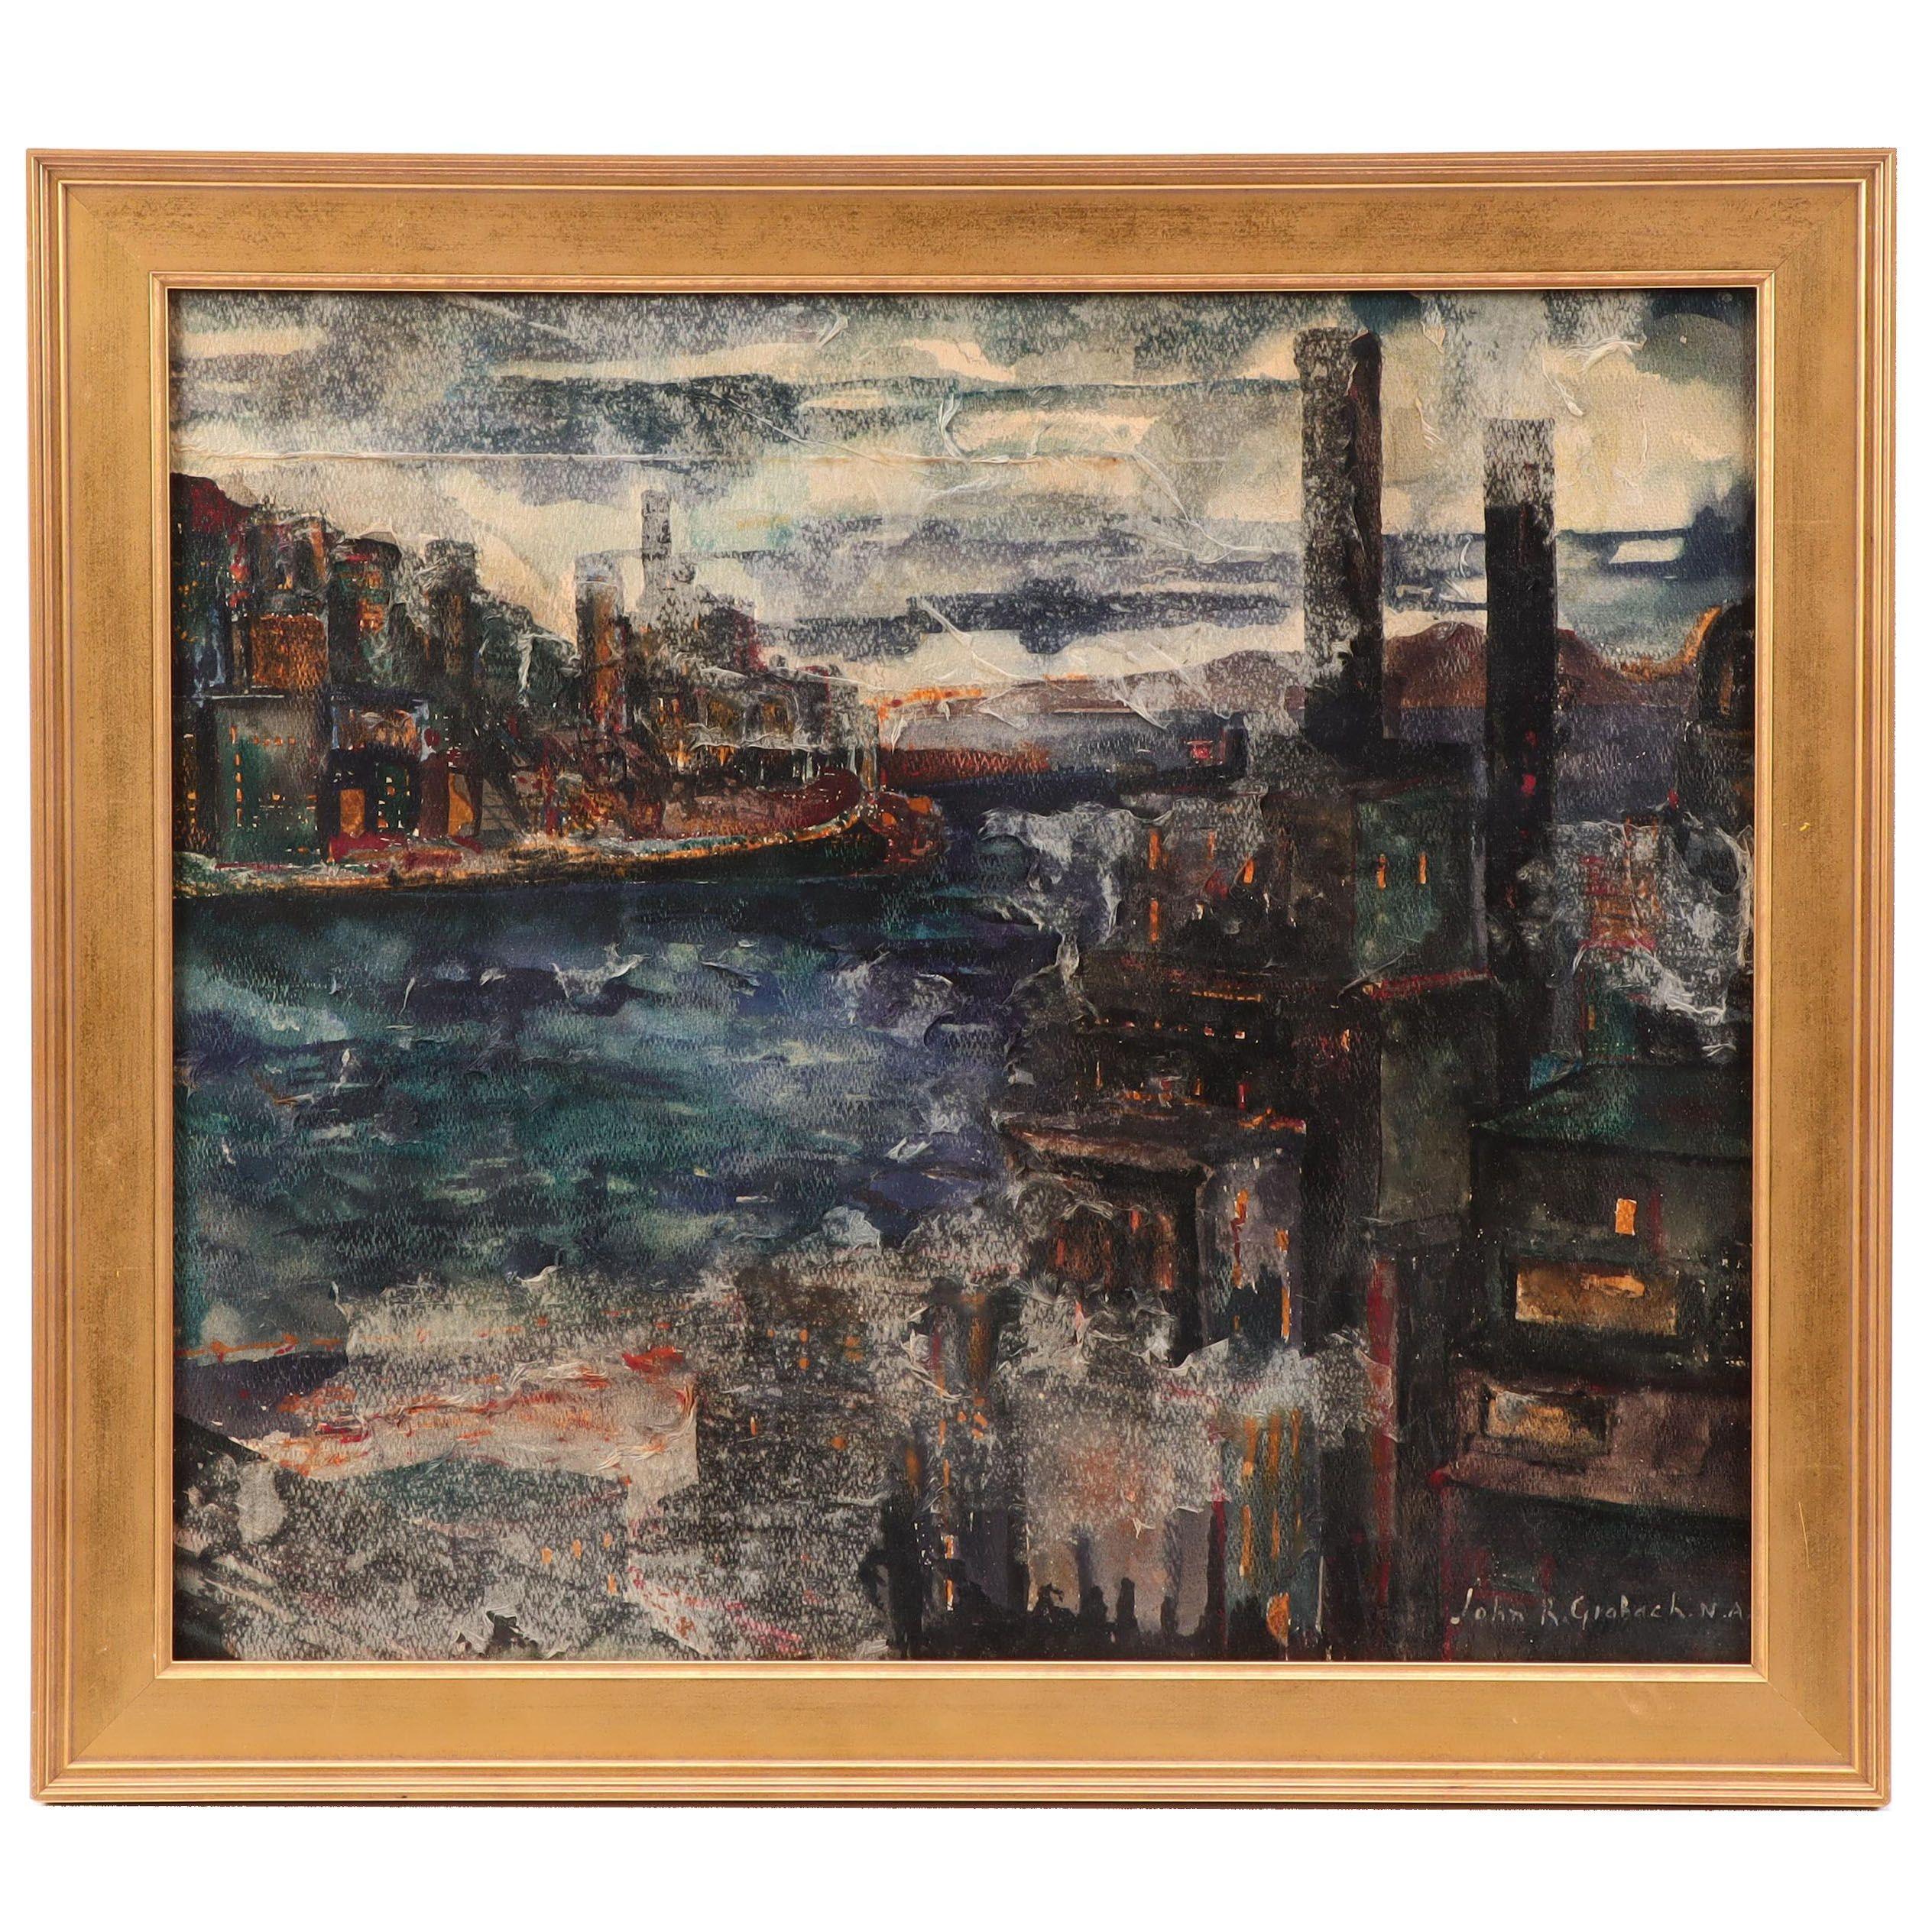 John R. Grabach Mixed Media Painting of New York Cityscape